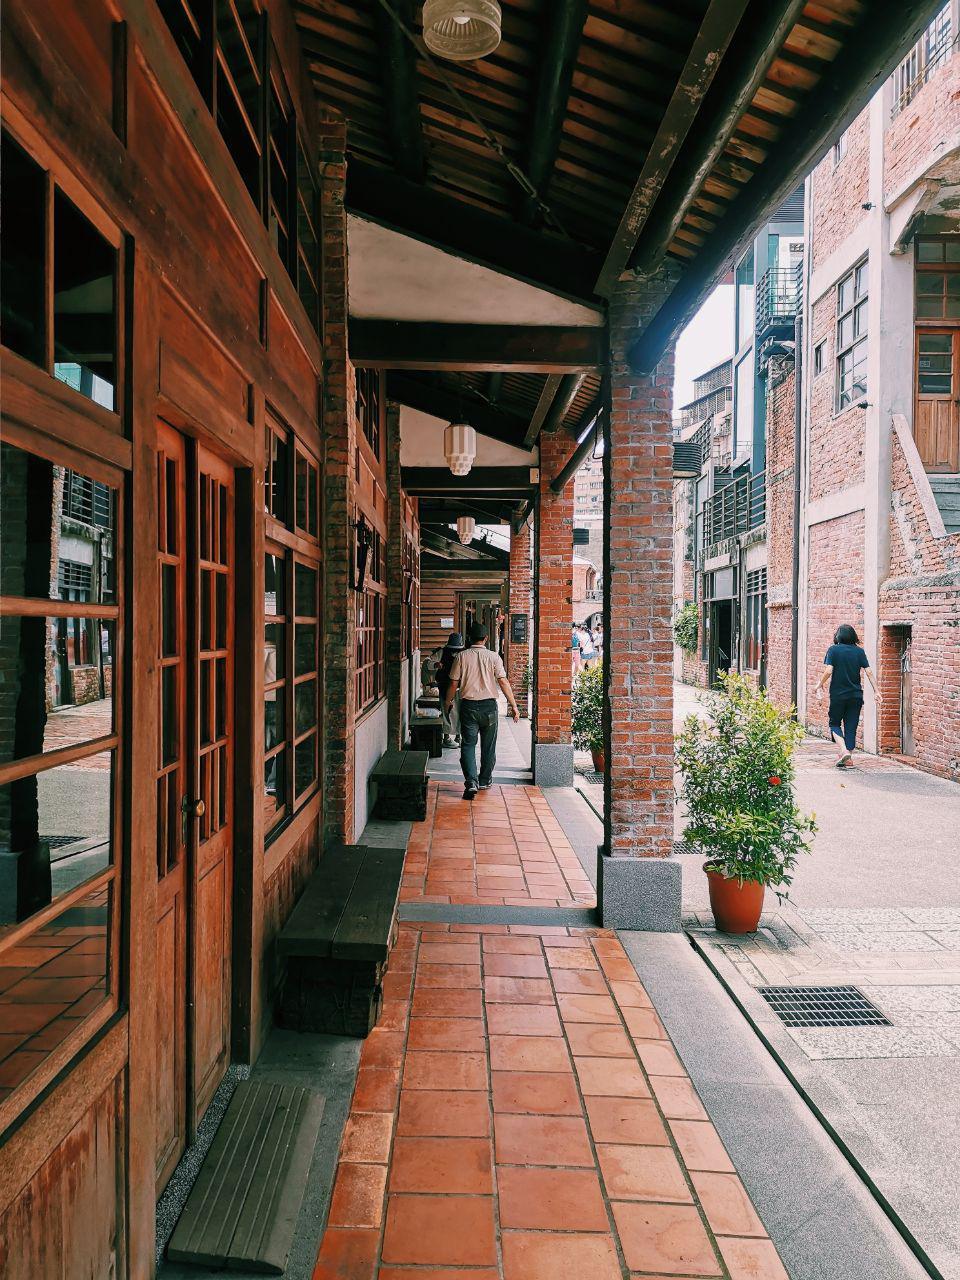 #OOTD - Bopiliao Historical Block